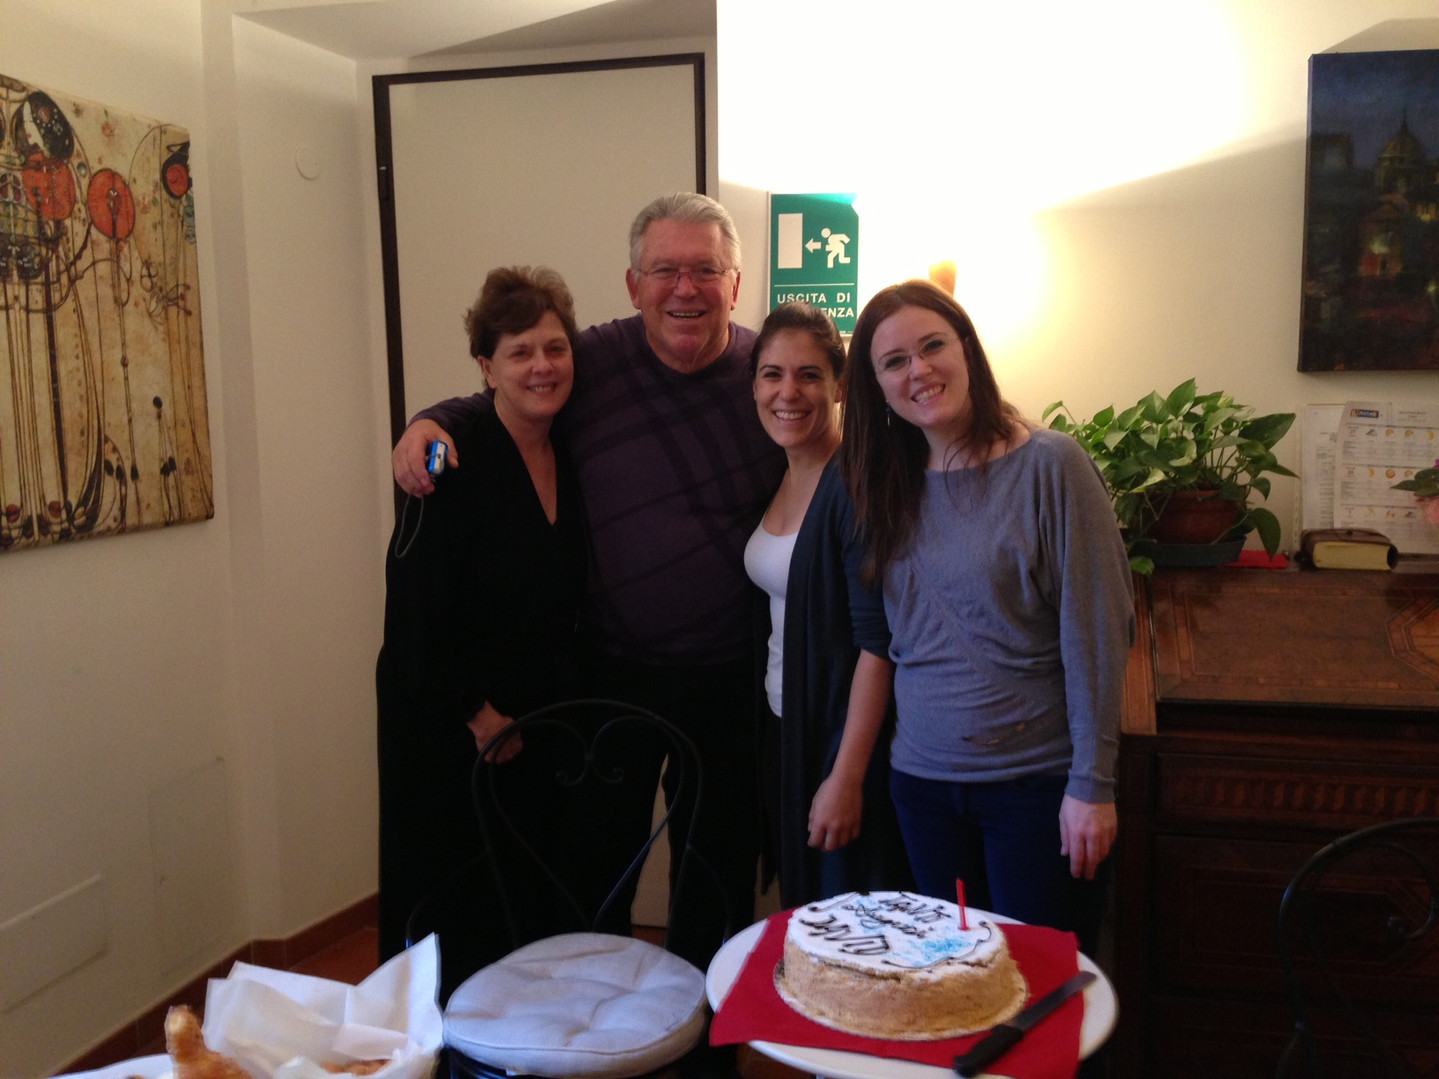 20130228_David&Julia_birthday_cake.JPG